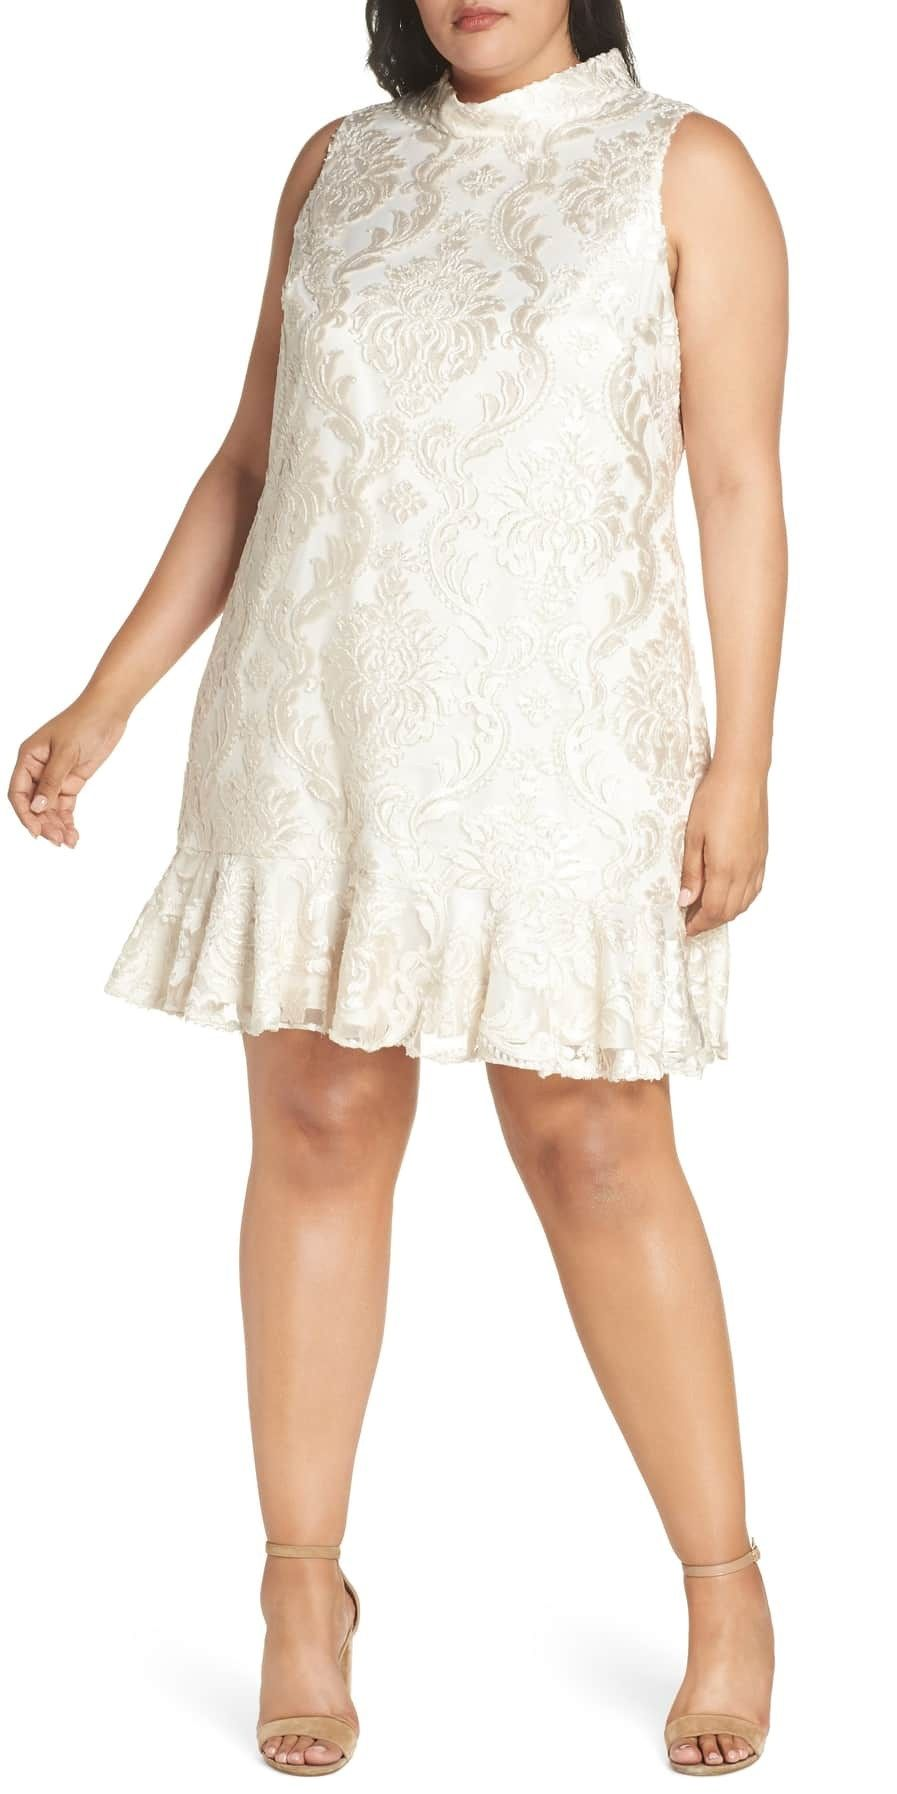 20 Plus Size Rehearsal Dinner Dresses Alexa Webb Plus Size Wedding Guest Dresses Rehearsal Dinner Dresses Best Party Dresses [ 1794 x 897 Pixel ]